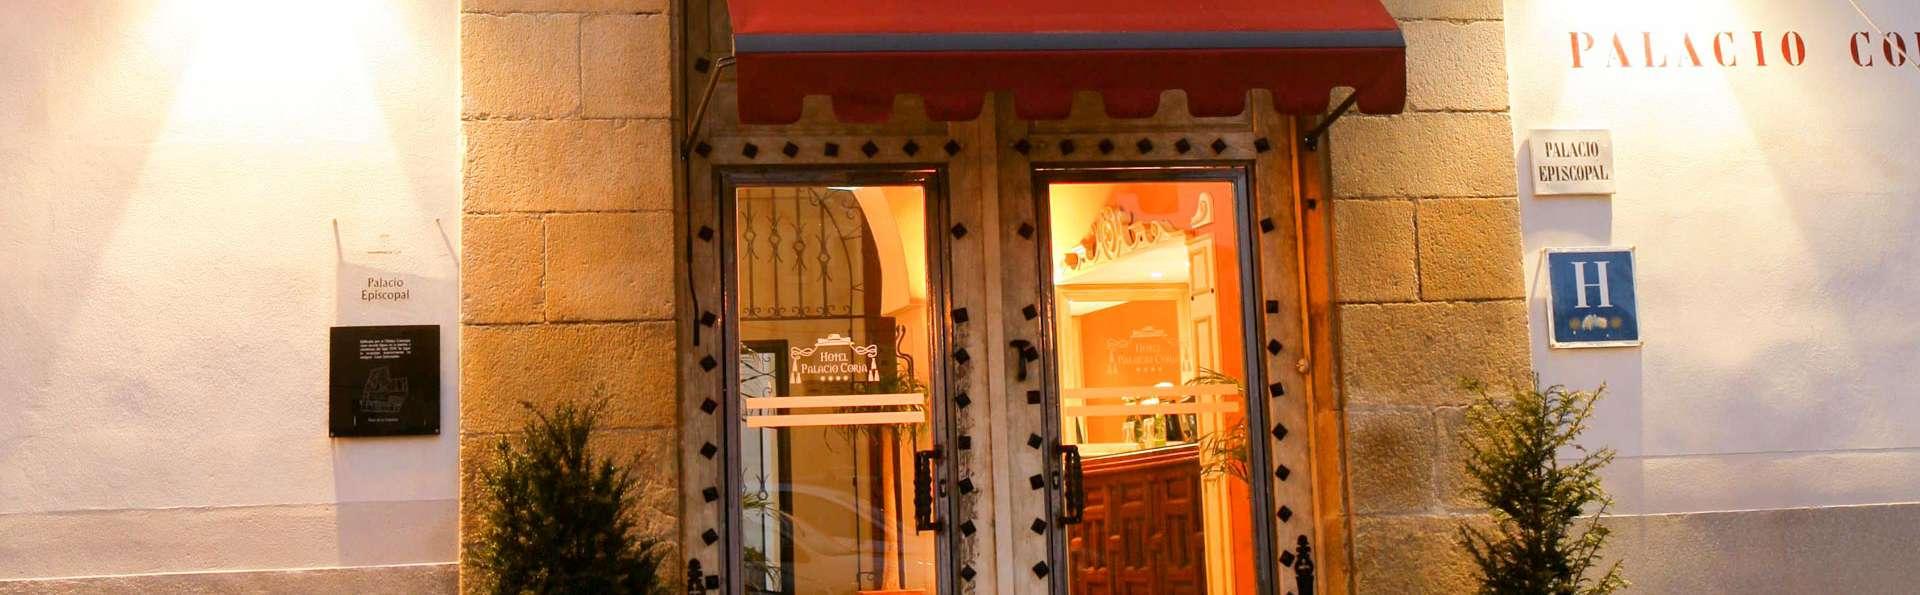 AHC Hotel Palacio Coria - EDIT_FRONT_02.jpg